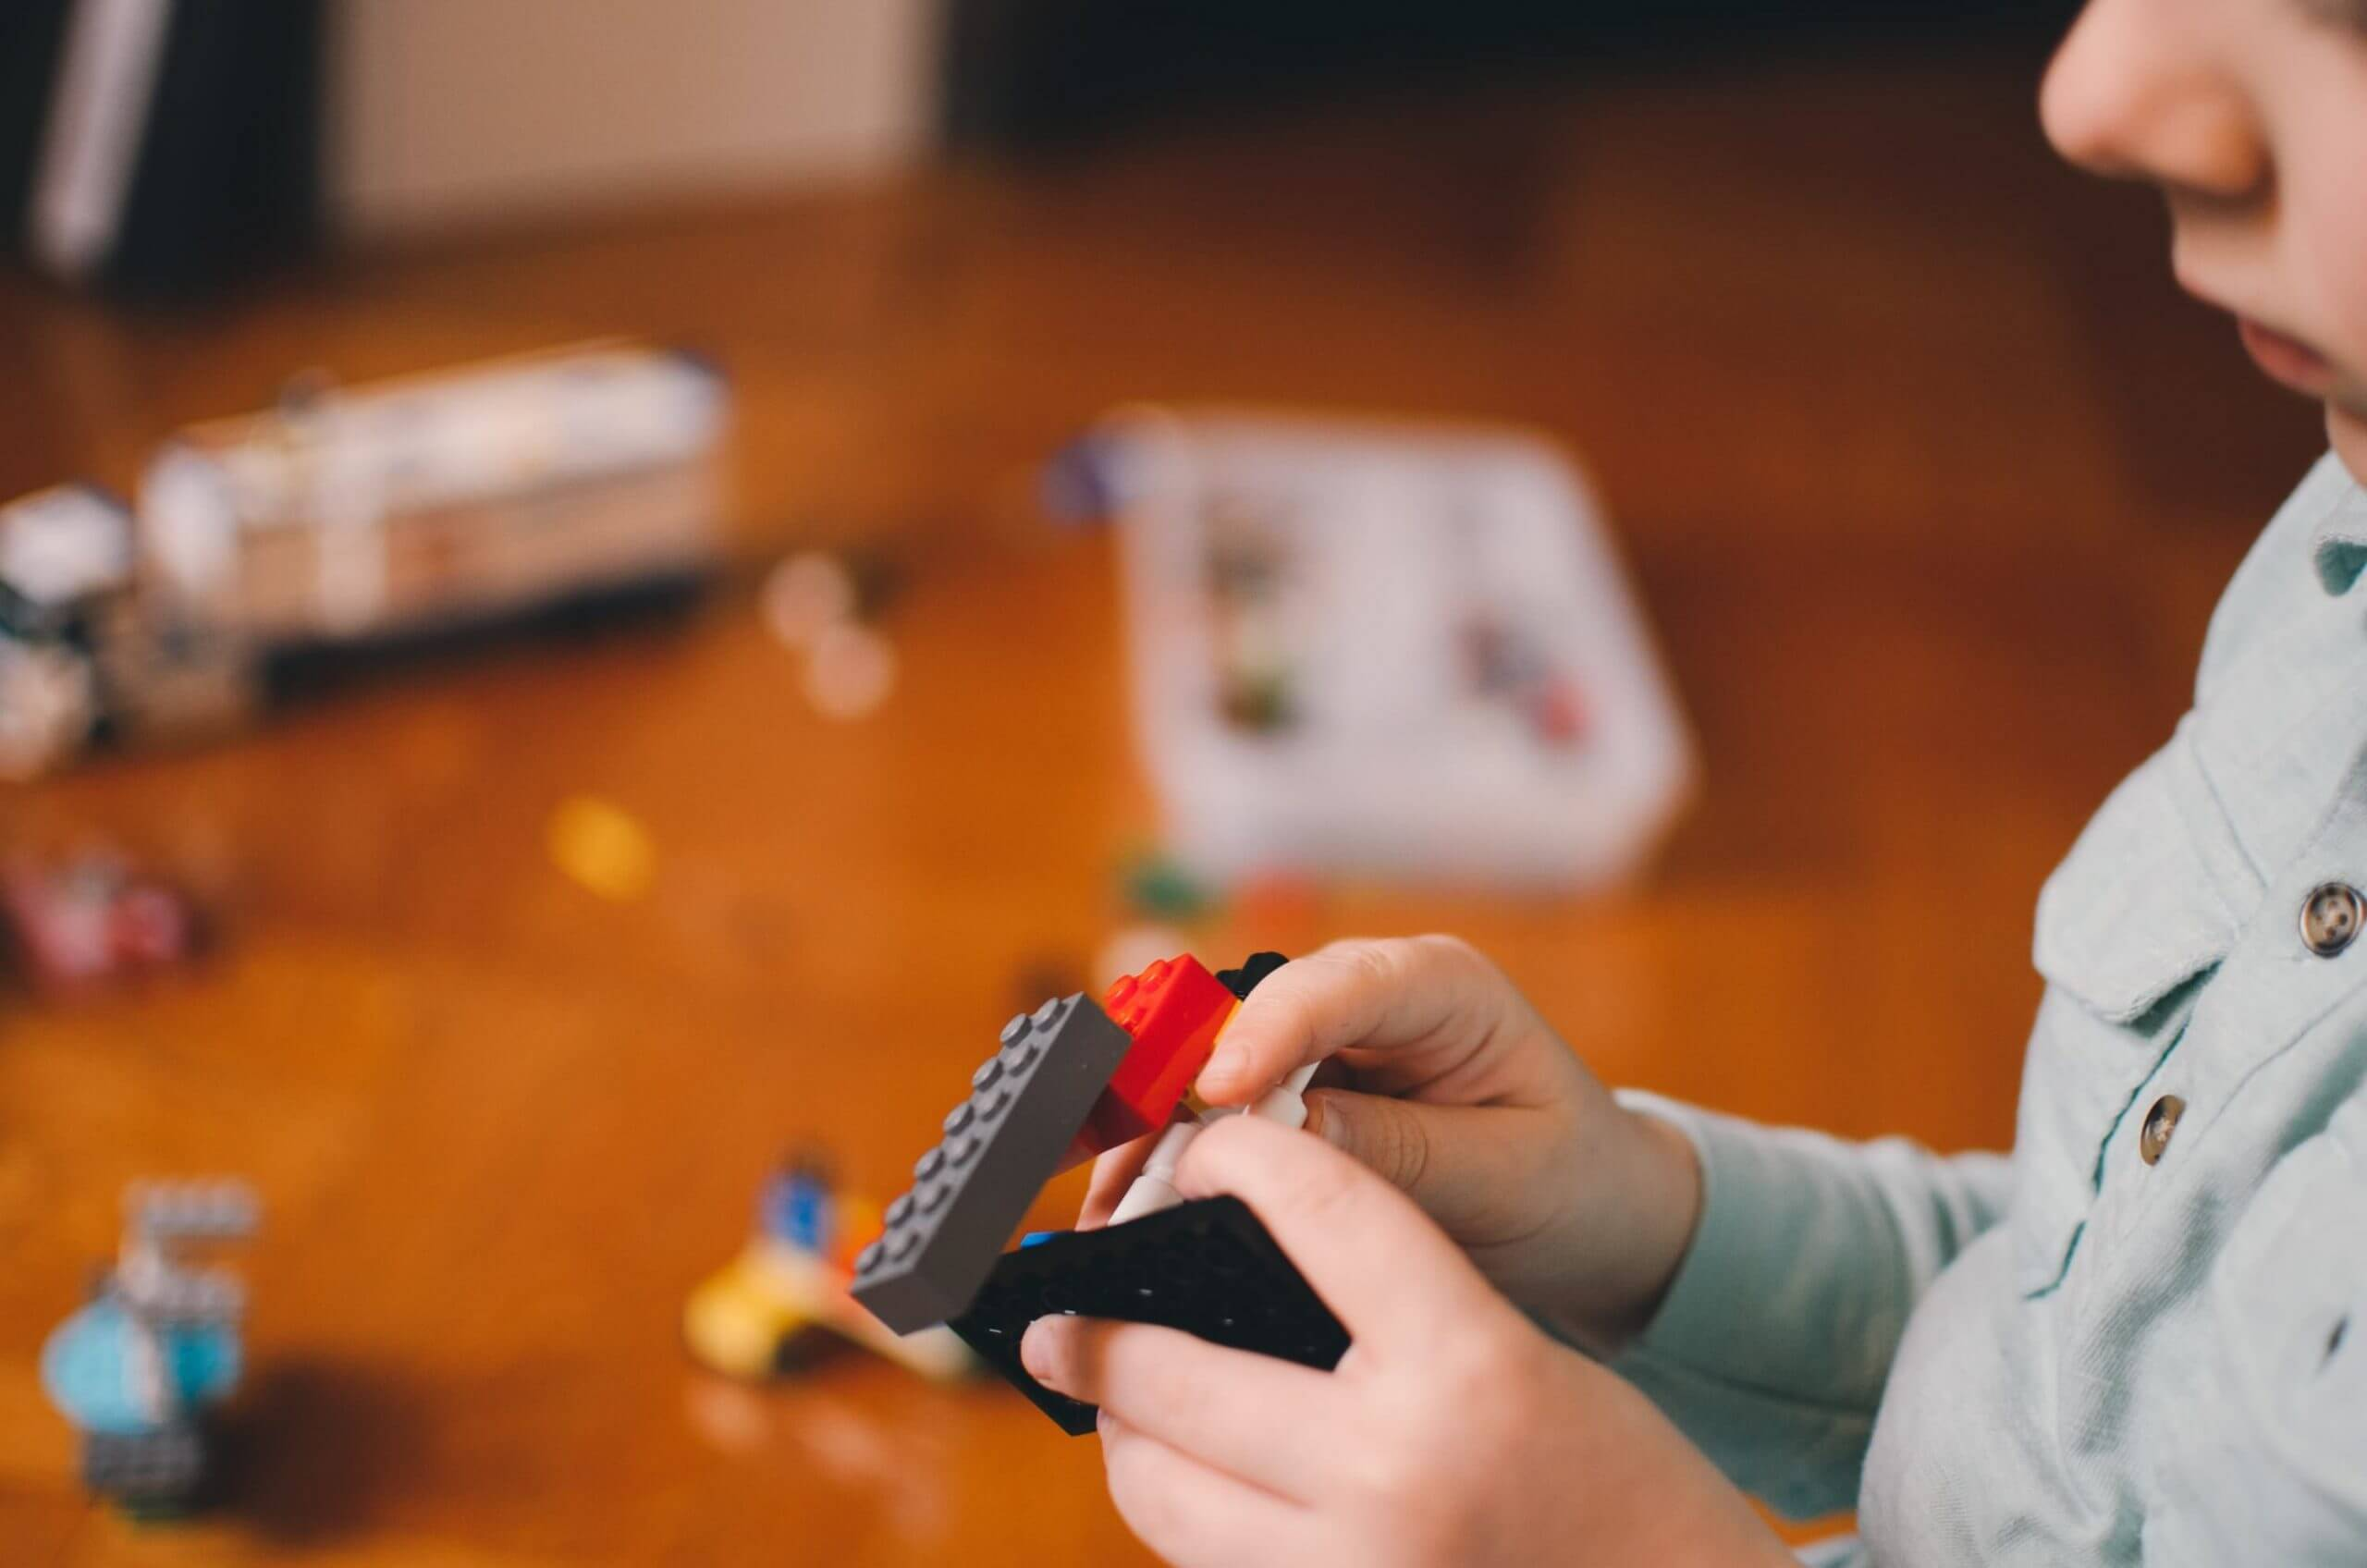 Kind spielt Lego